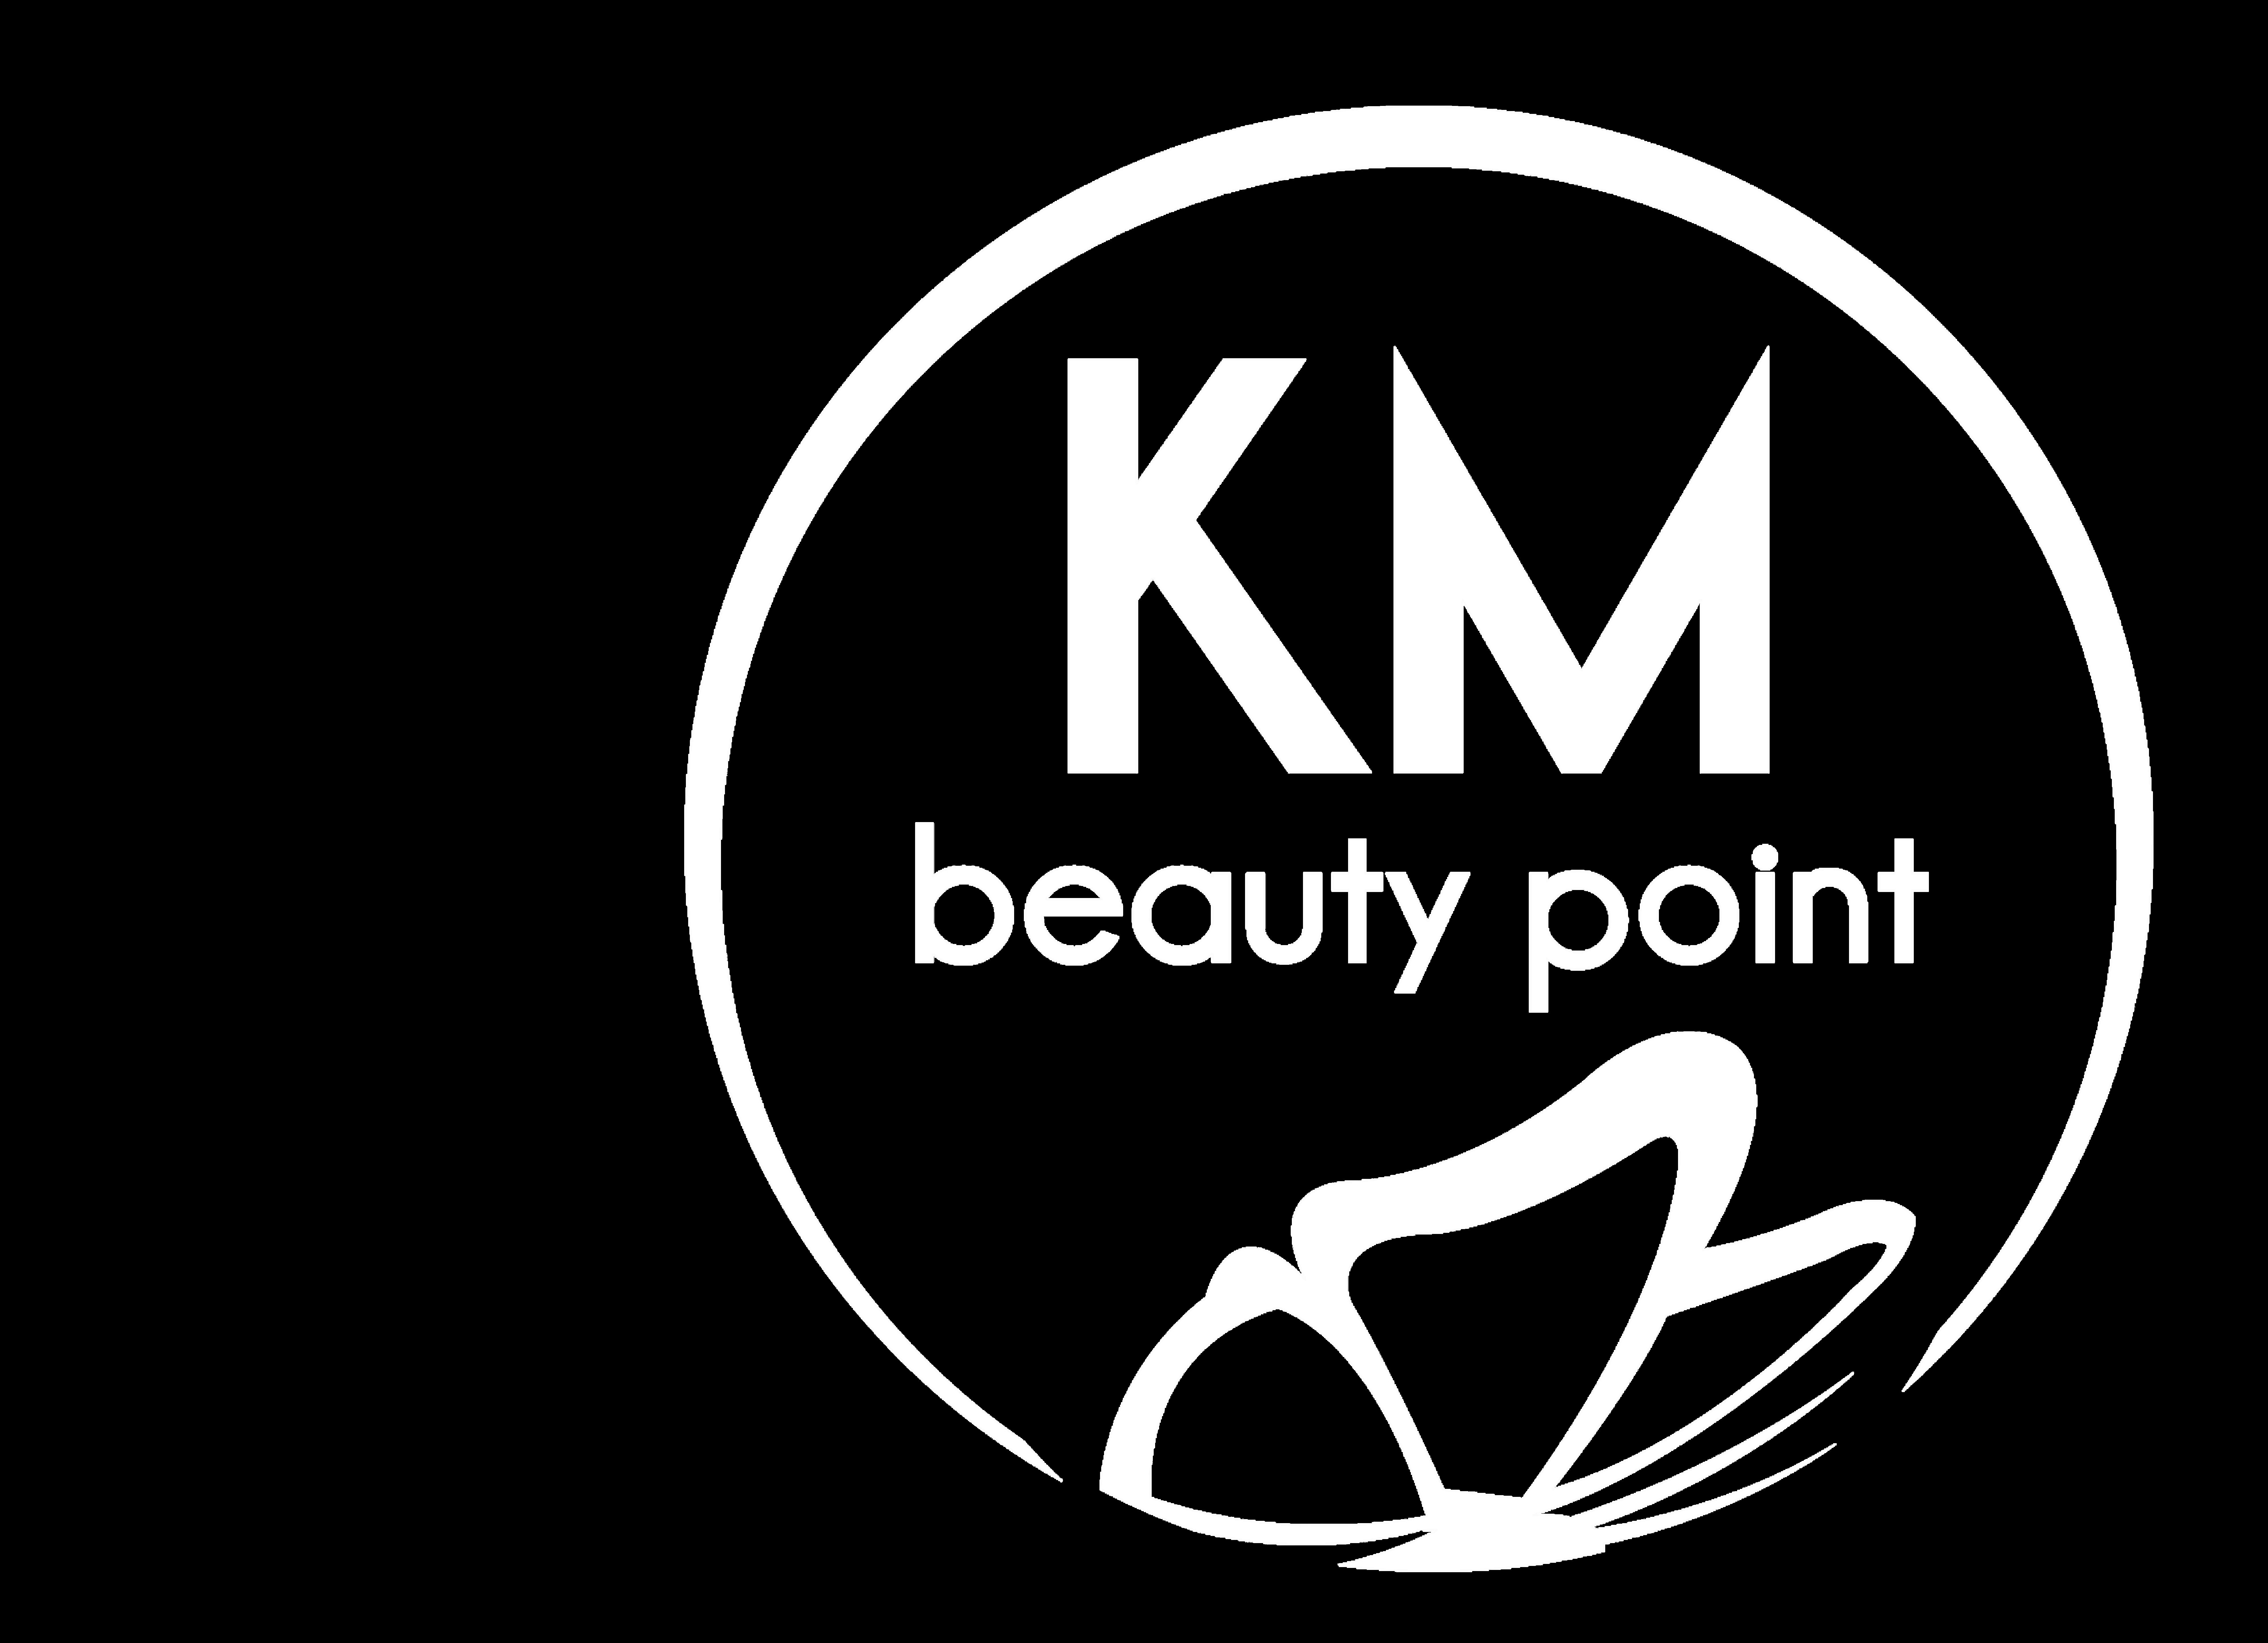 kmbeautypoint.cz